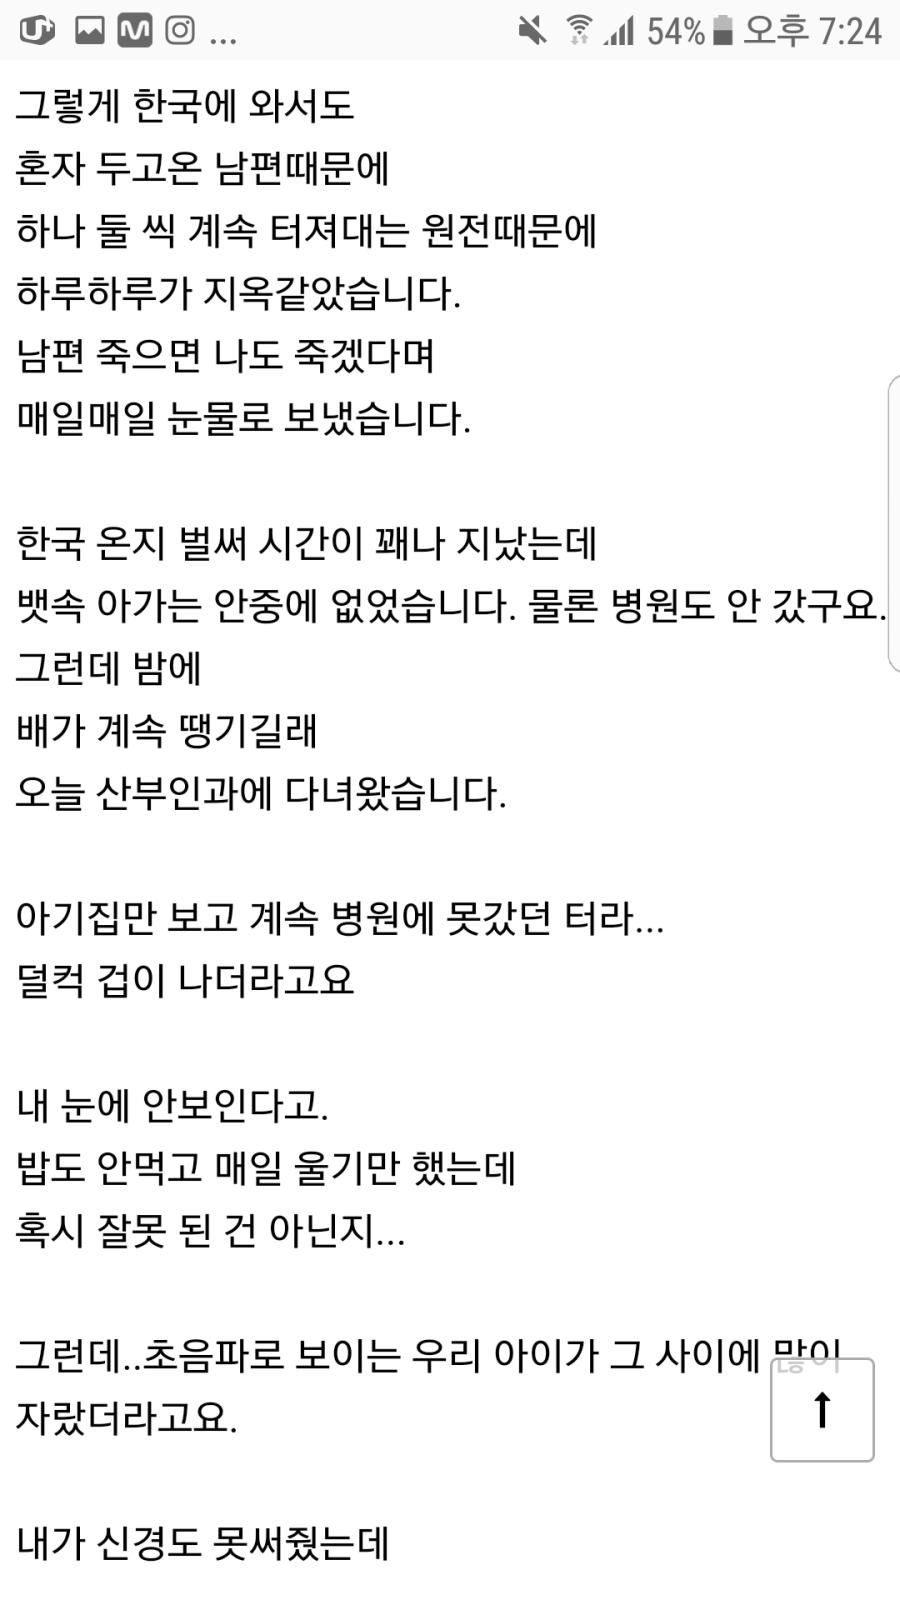 5.png 김석류가 직접올린 일본지진경험담 JPG